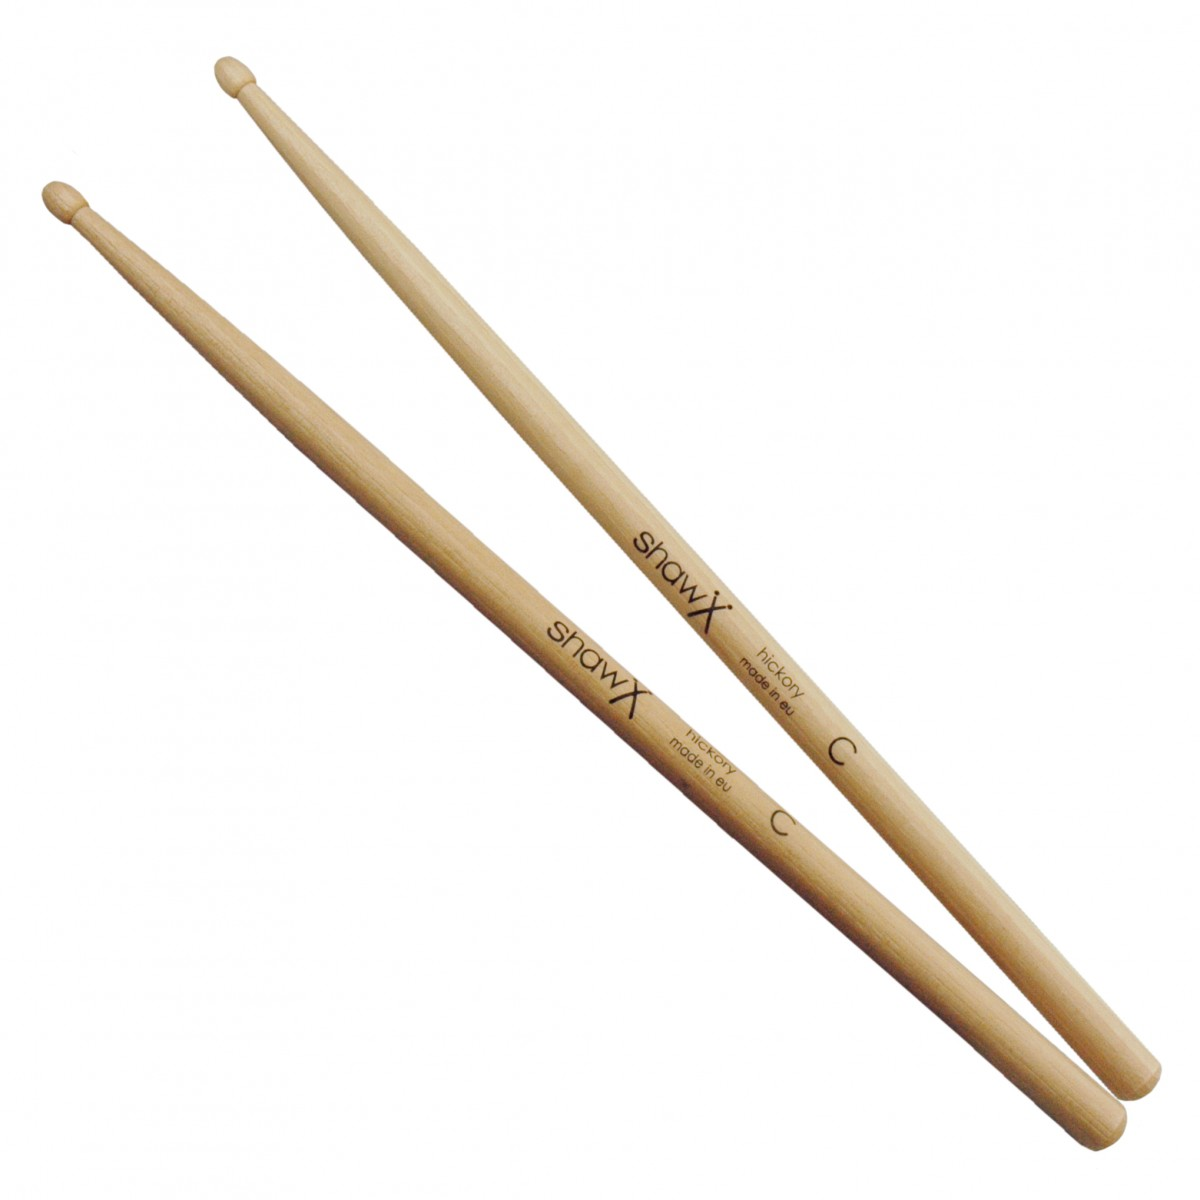 shaw heritage series drum sticks vintage british sizes c c e drumattic. Black Bedroom Furniture Sets. Home Design Ideas